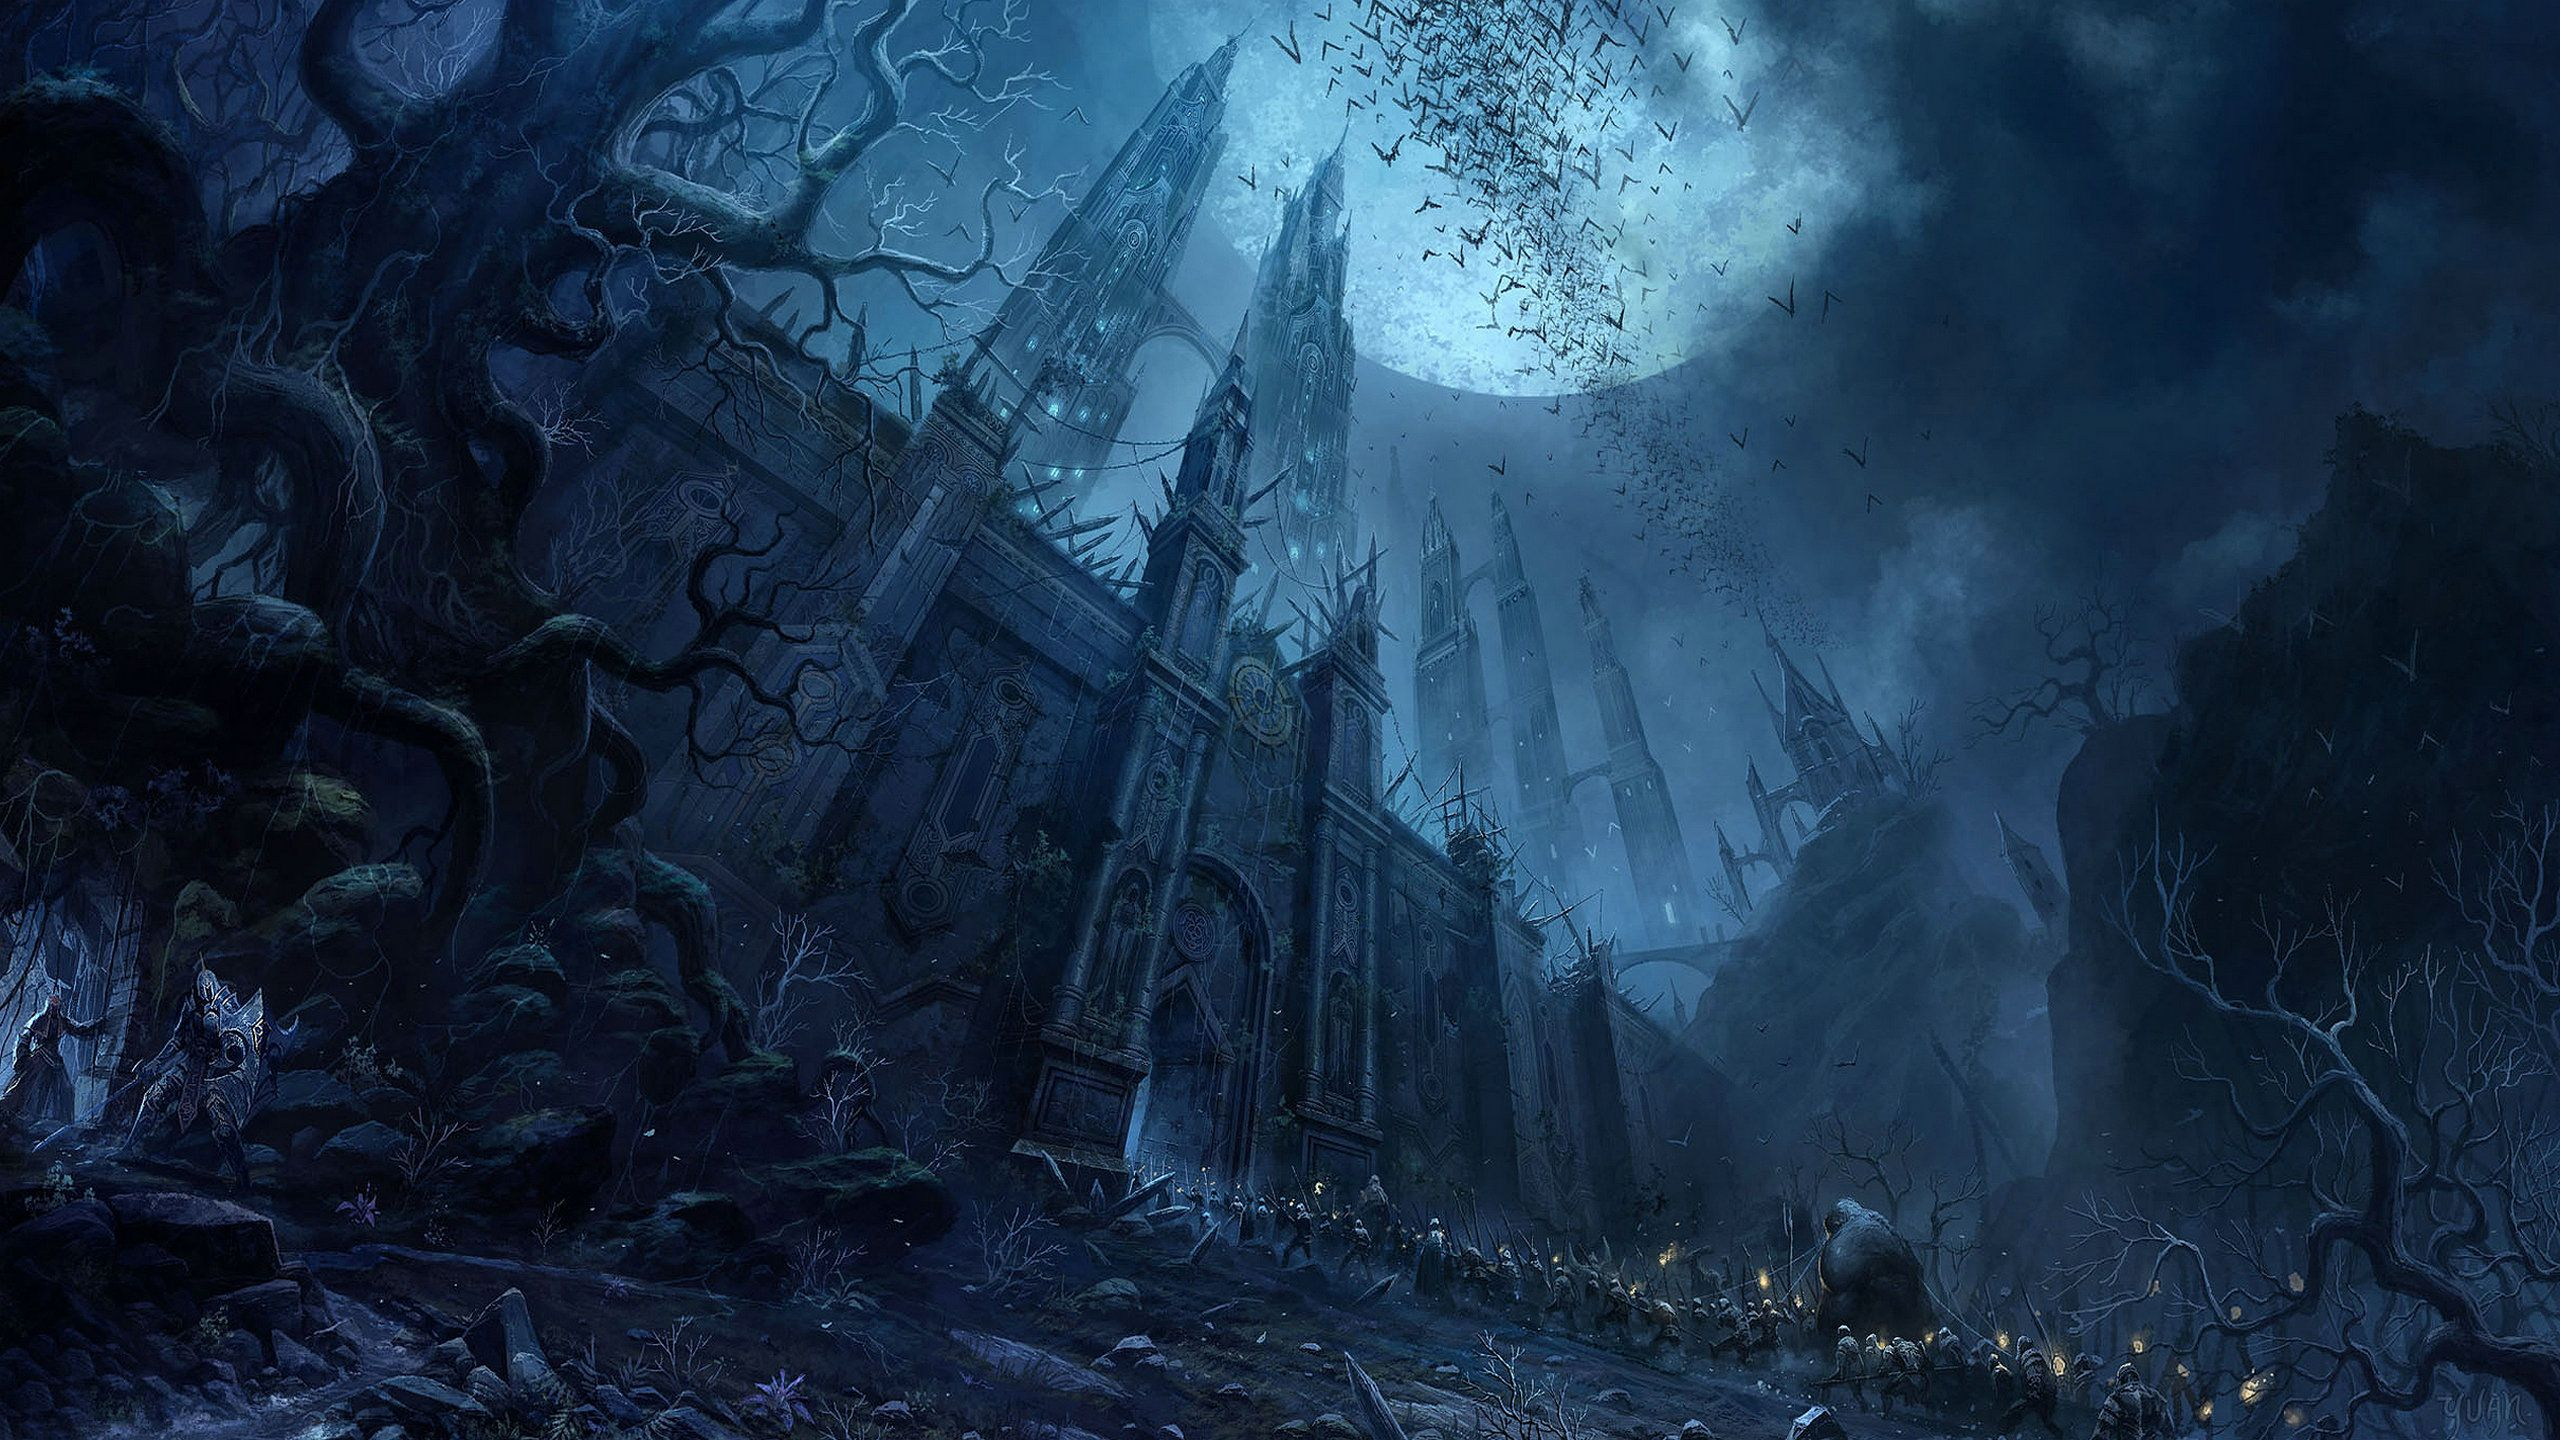 Dark Moon Fantasy 2560x1440 Hd Wallpaper And Free Stock Photo Fantasy Art Landscapes Dark Fantasy Art Dark Moon